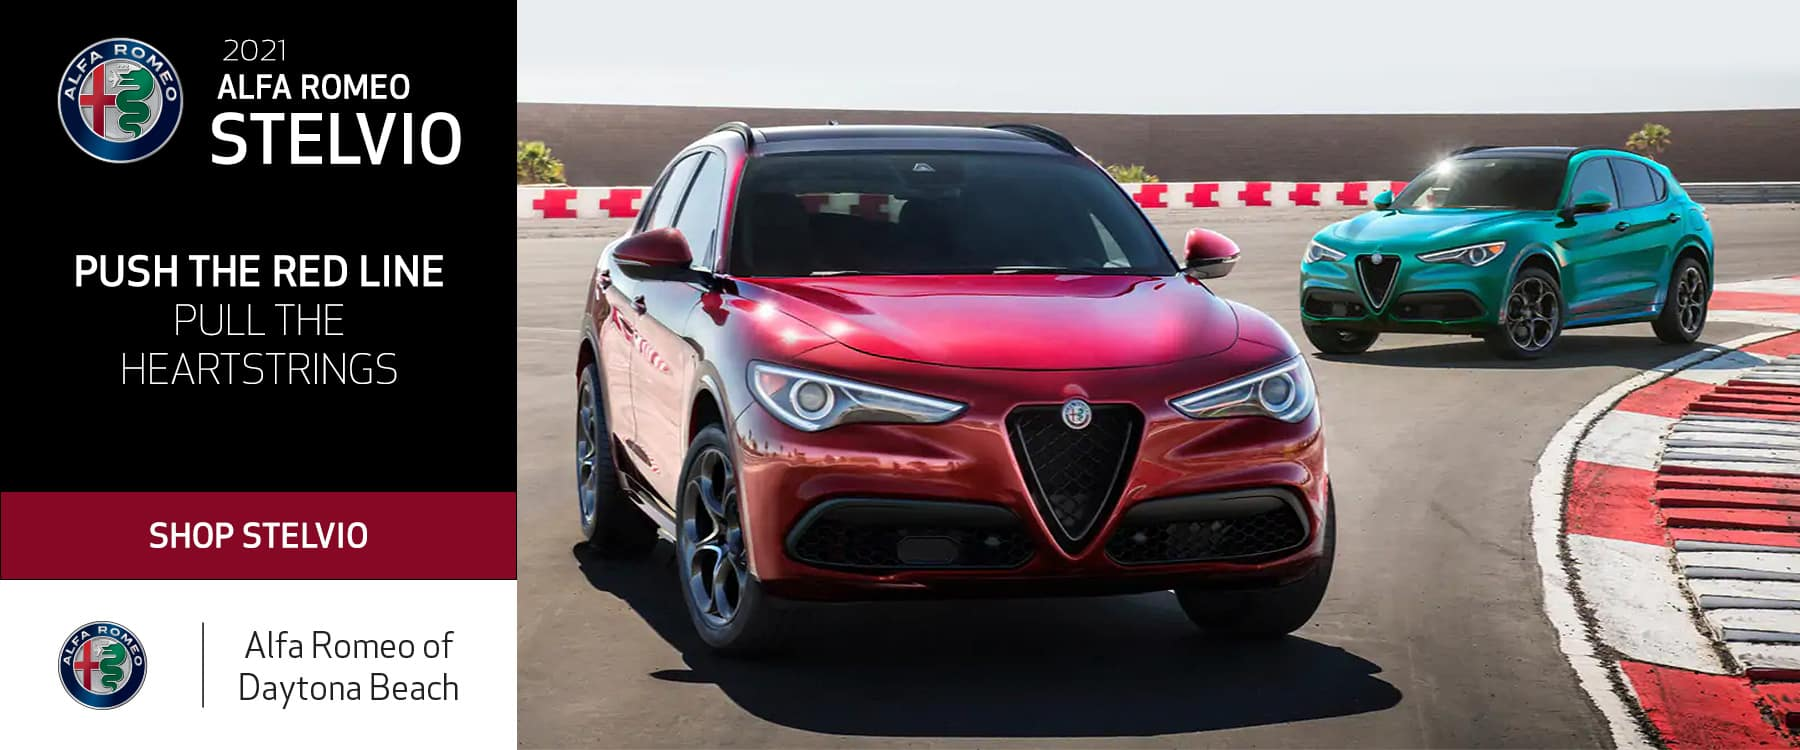 DMAR-2021-Alfa-Romeo-1800×750-MY21-Stelvio-Evergreen